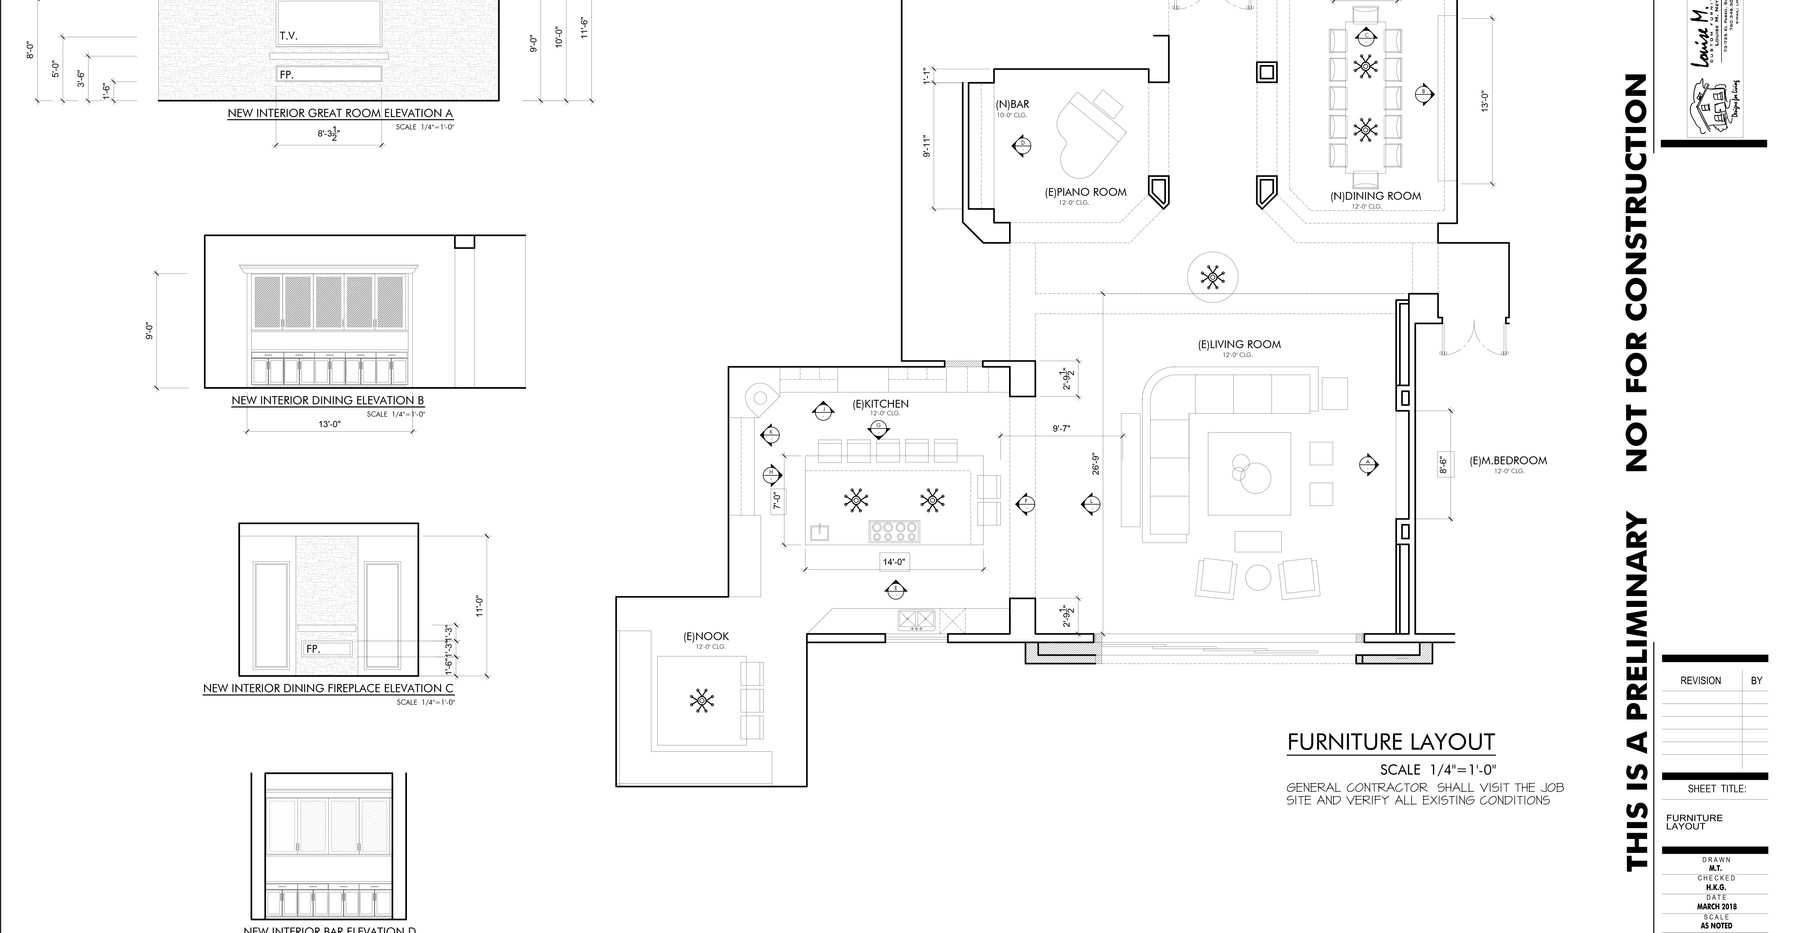 furniture layout timo.jpg